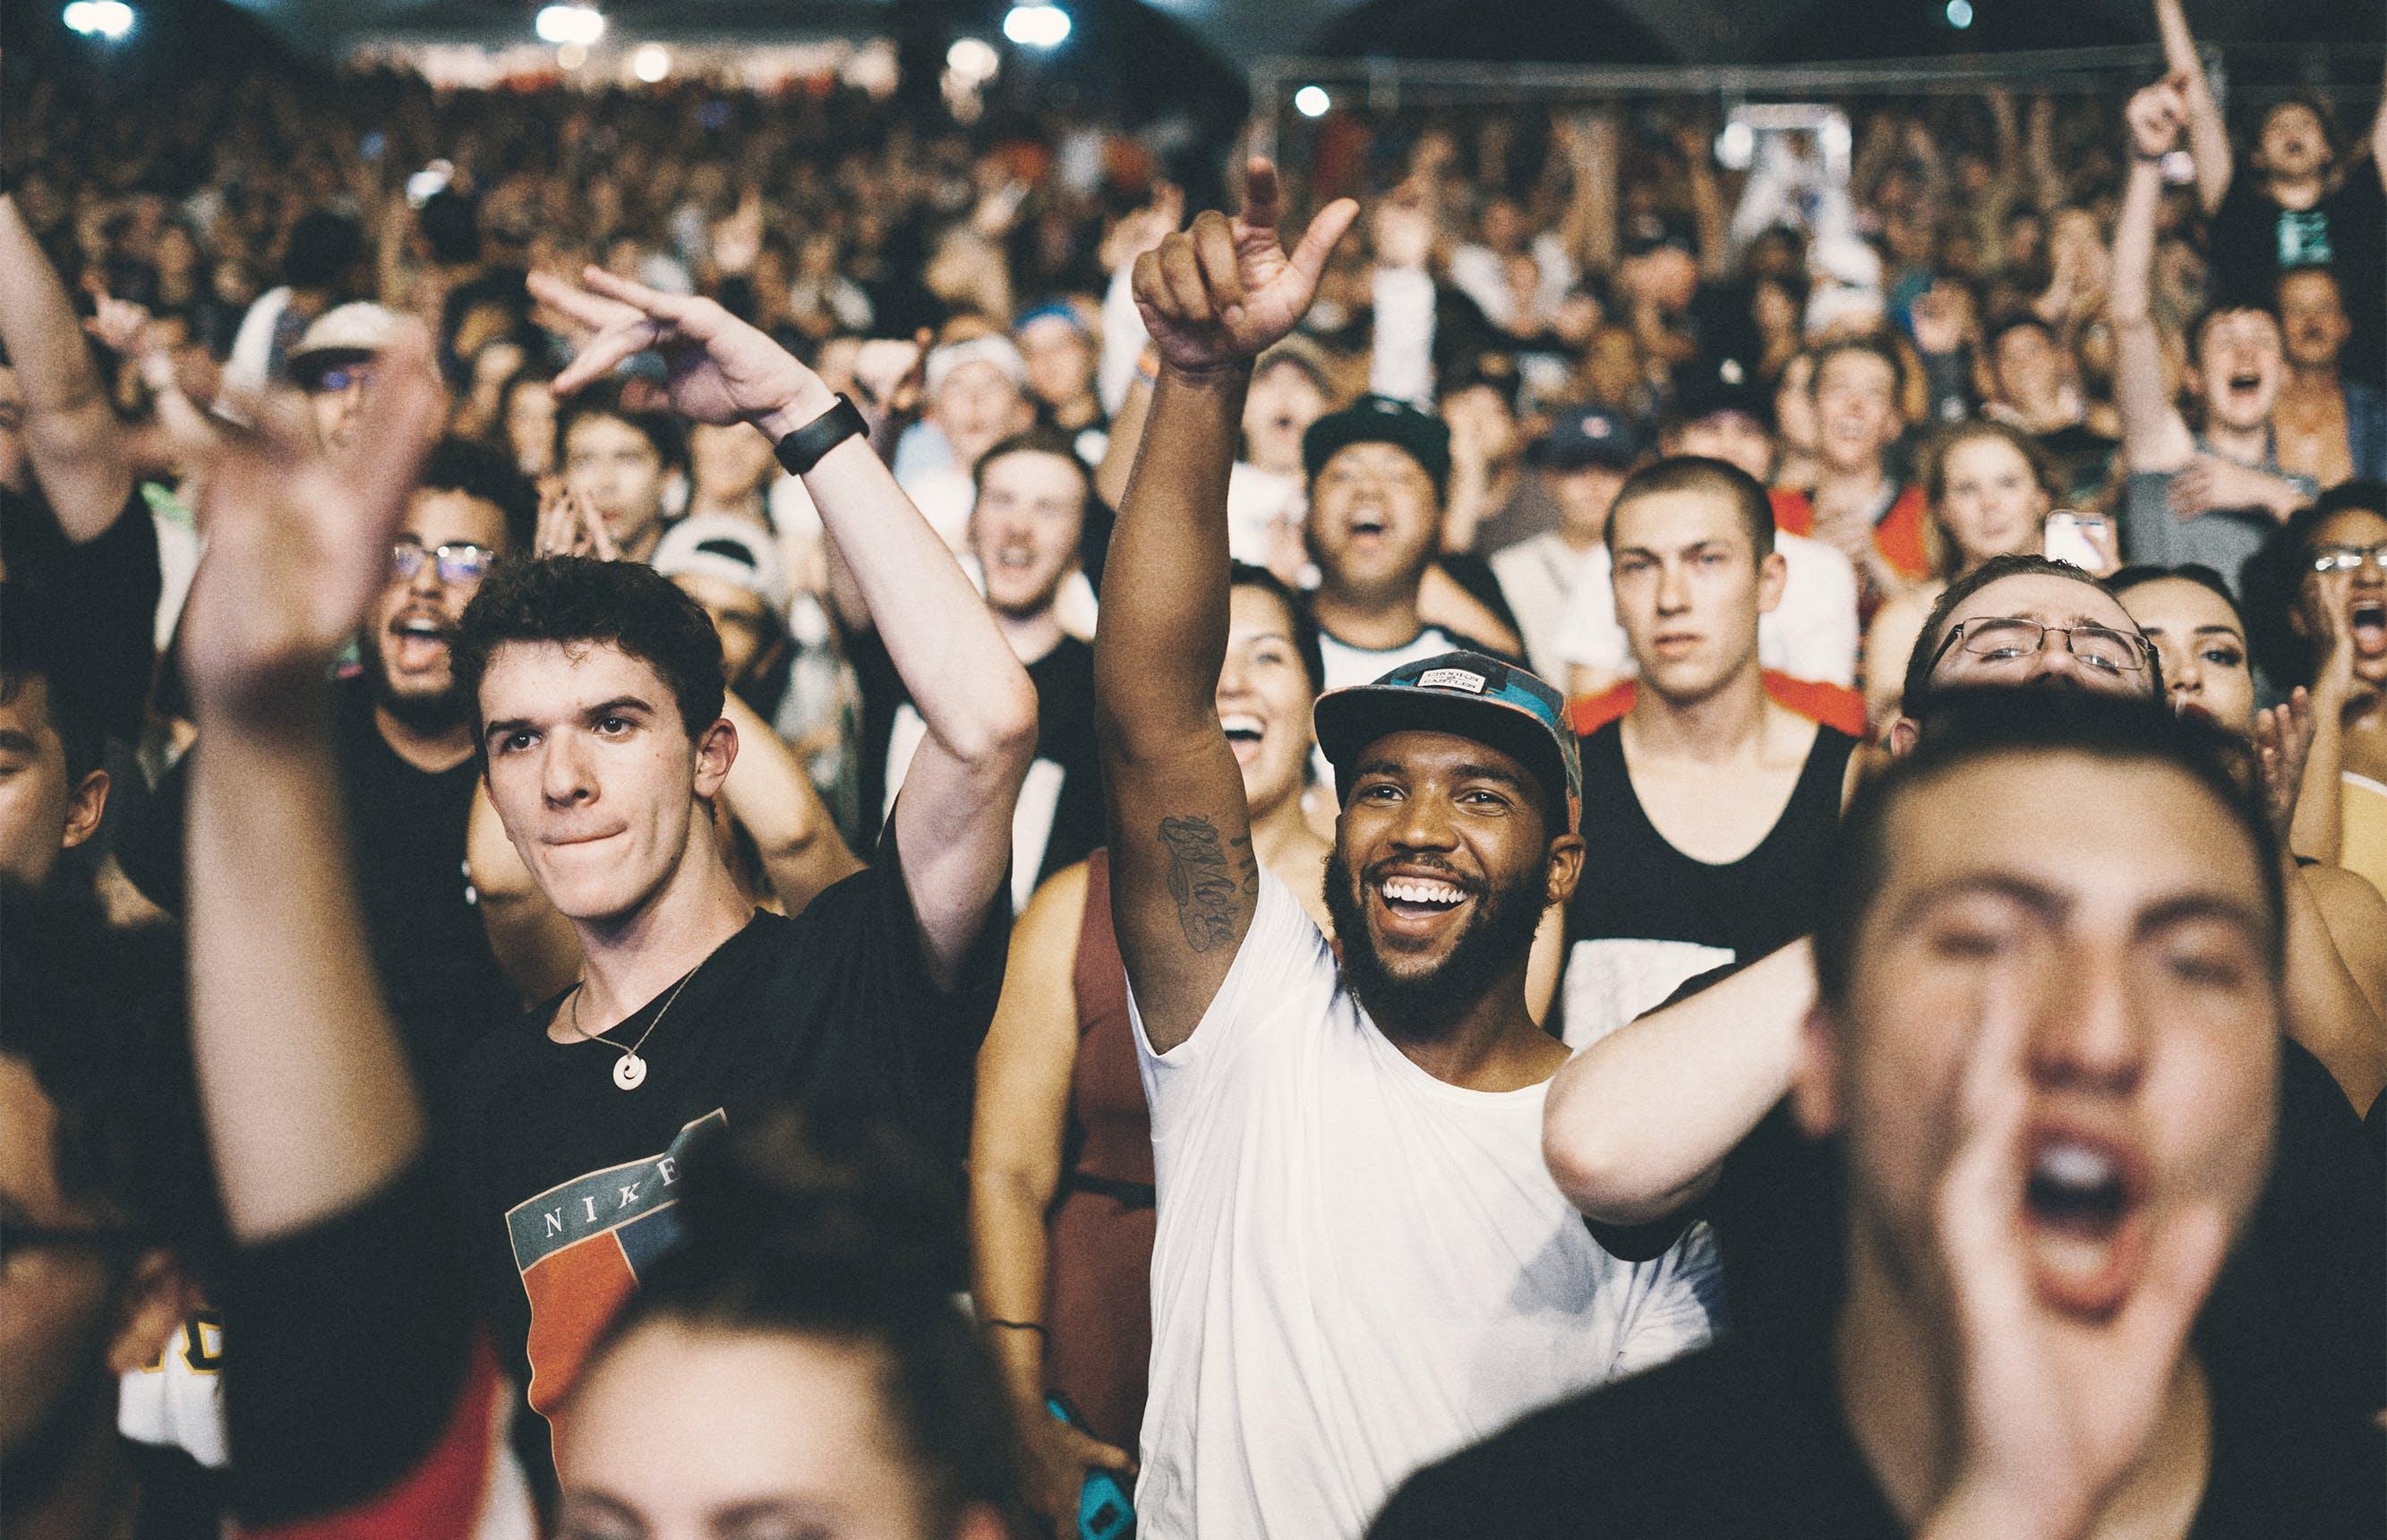 Cultuur na corona: wat wil het publiek?